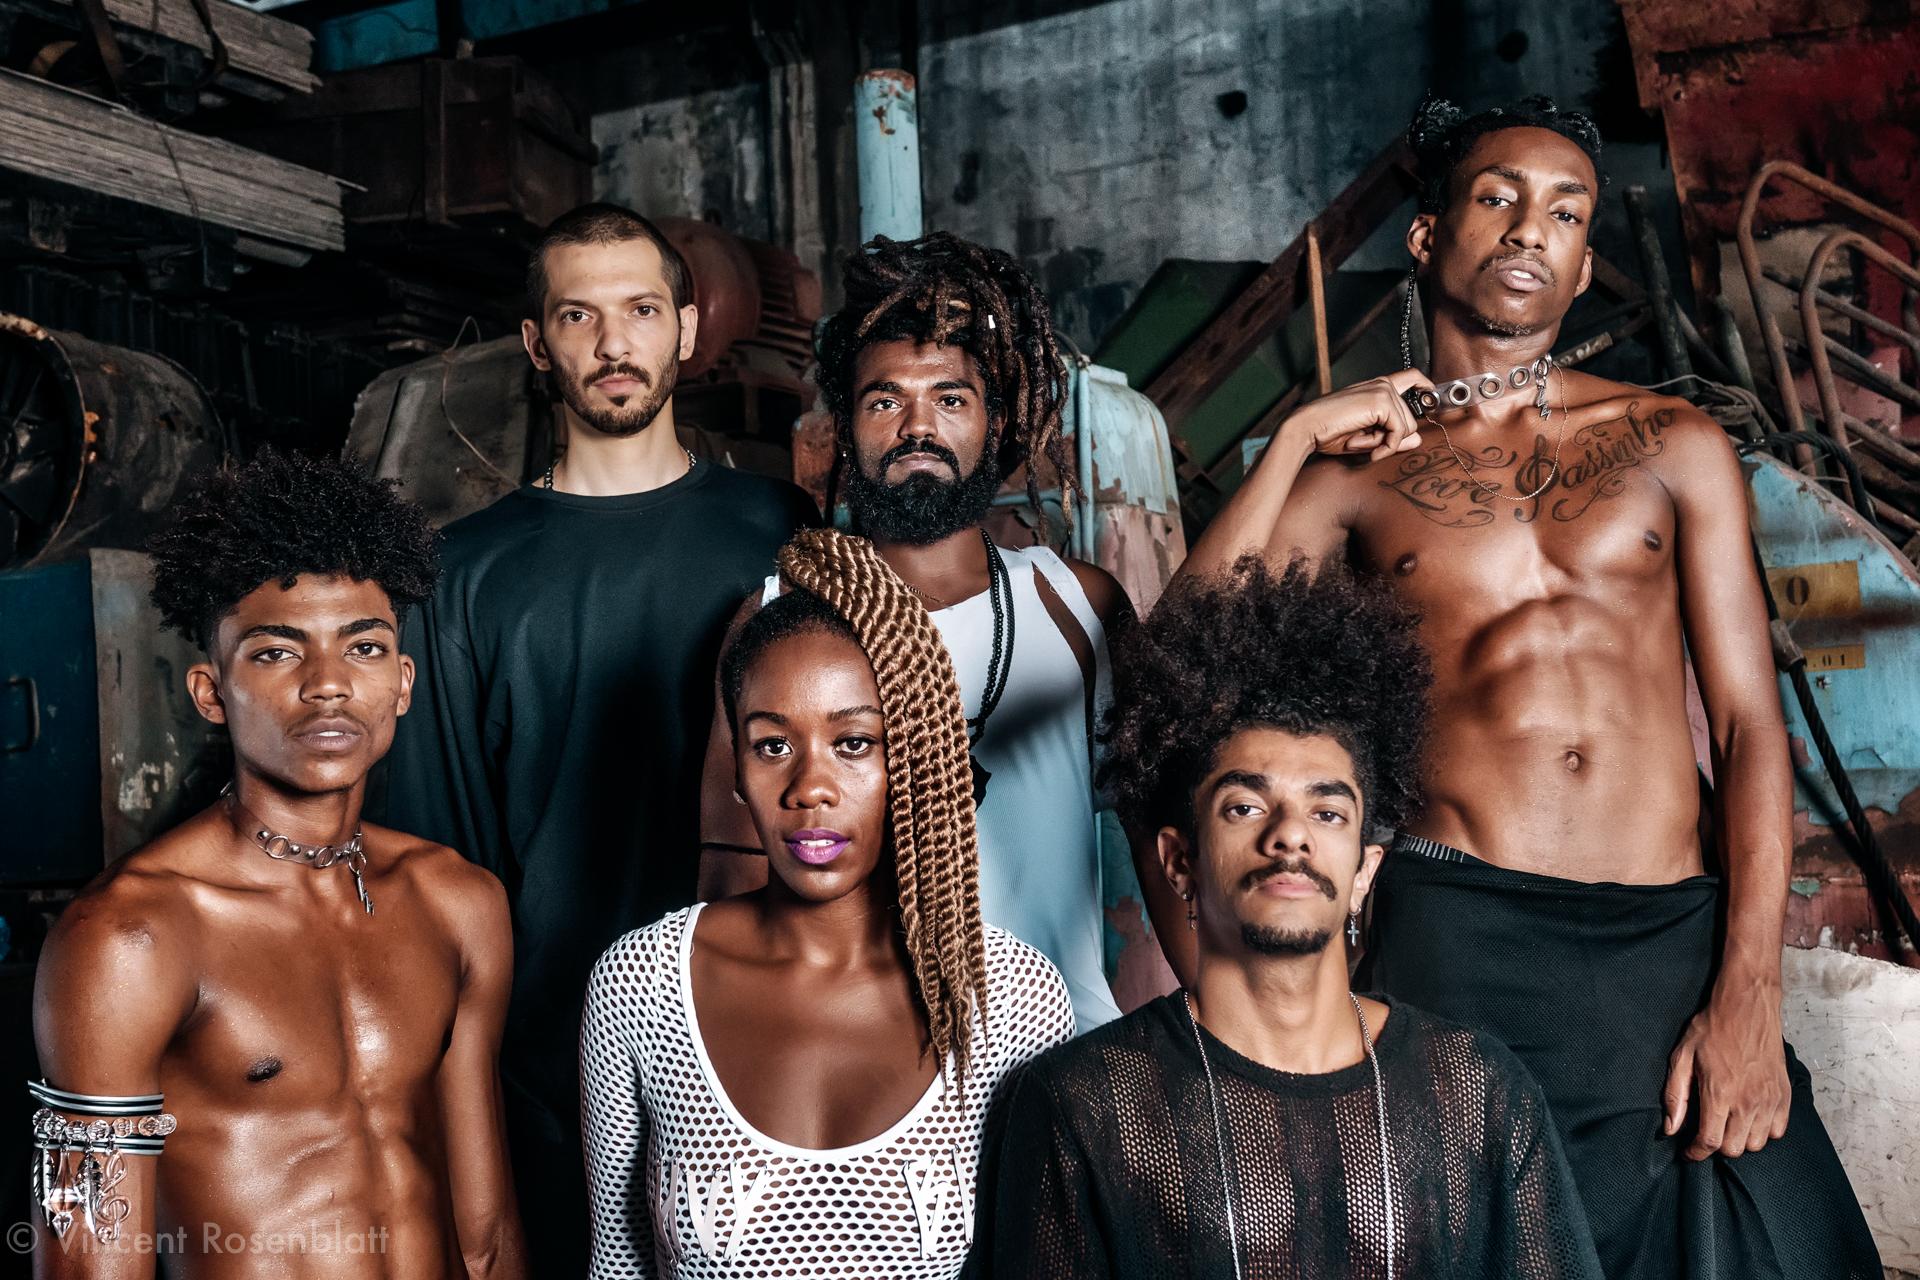 Heavy Baile - 2018DJ Thai - MC Tchelinho - DJ Leo Justi - Dancers : Jonathan Neguebites - Sabrina Ginga & Ronald Sheick.